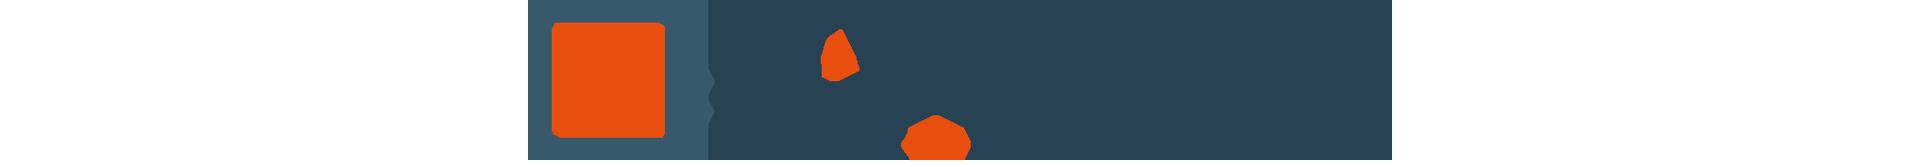 Notar Wacker Logo